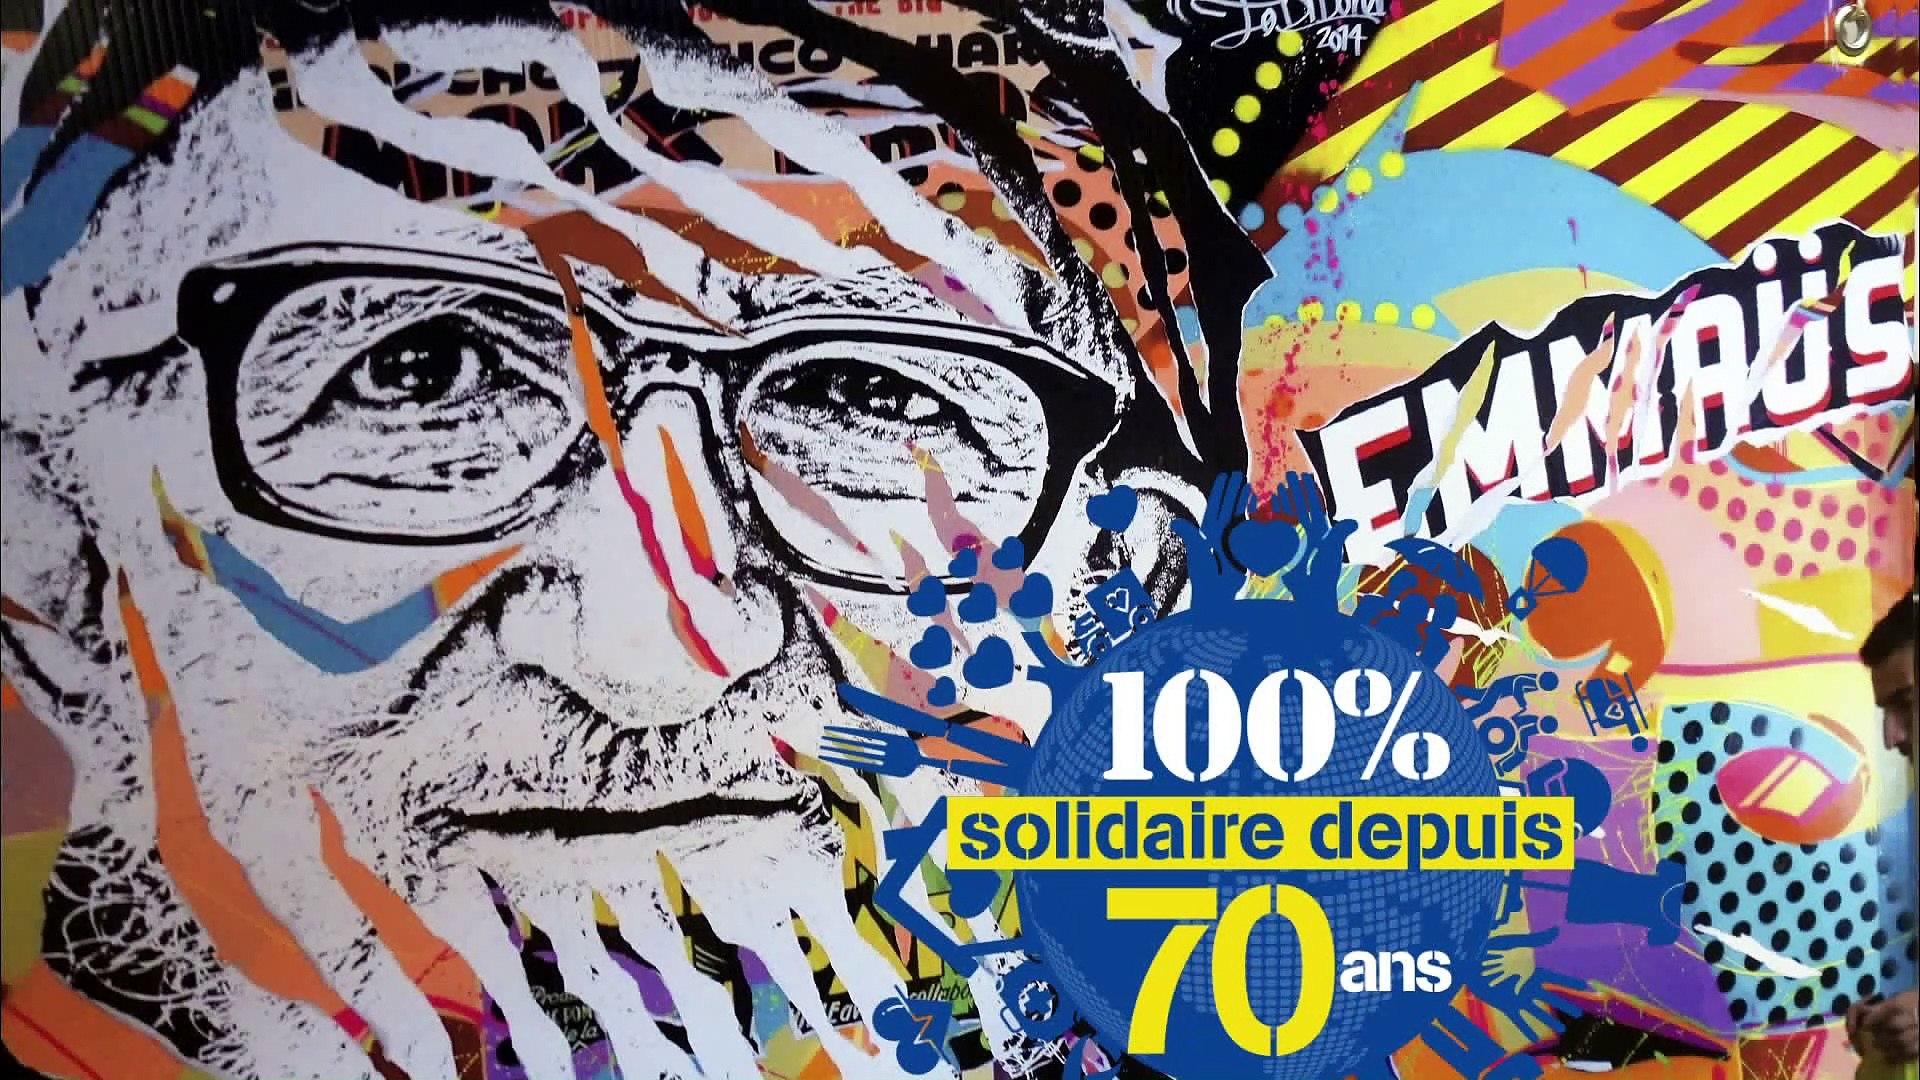 Toulouse Emmaüs Experience 100 Solidaire Depuis 70 Ans Hd 1080